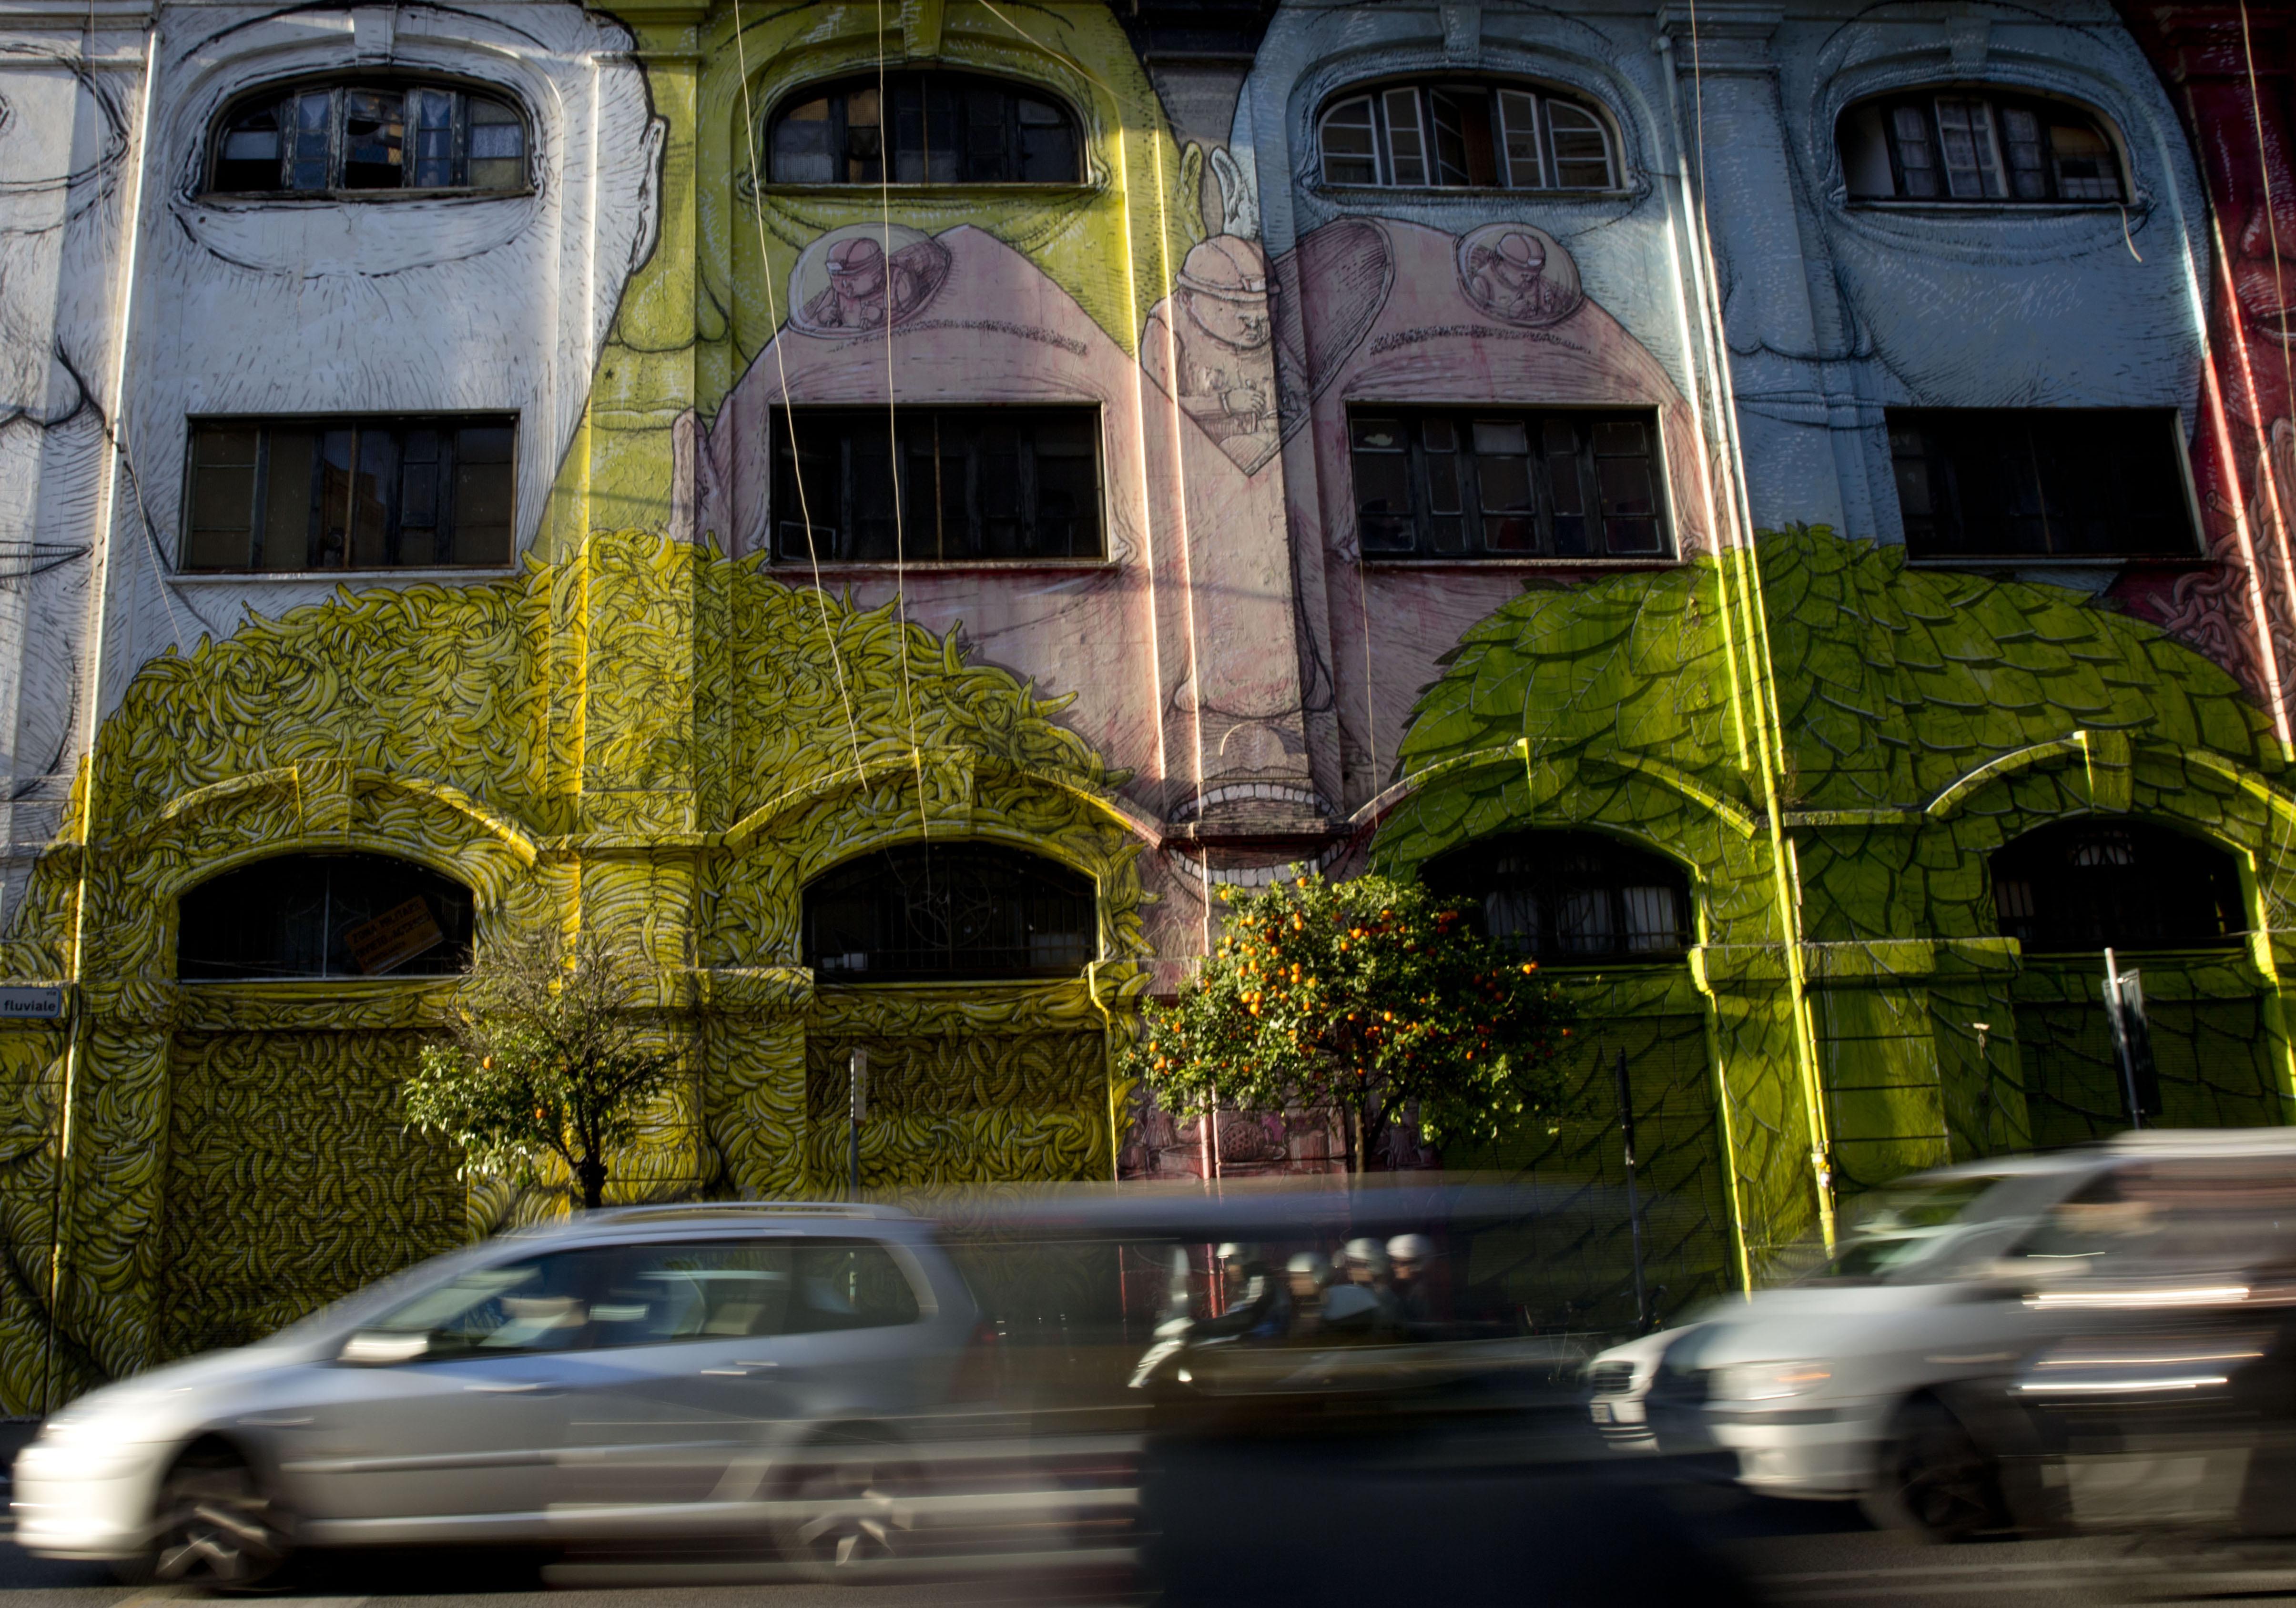 Cars run past a mural painted by Italian artist Blu in Rome, Wednesday, April 1, 2015. (AP Photo/Alessandra Tarantino)